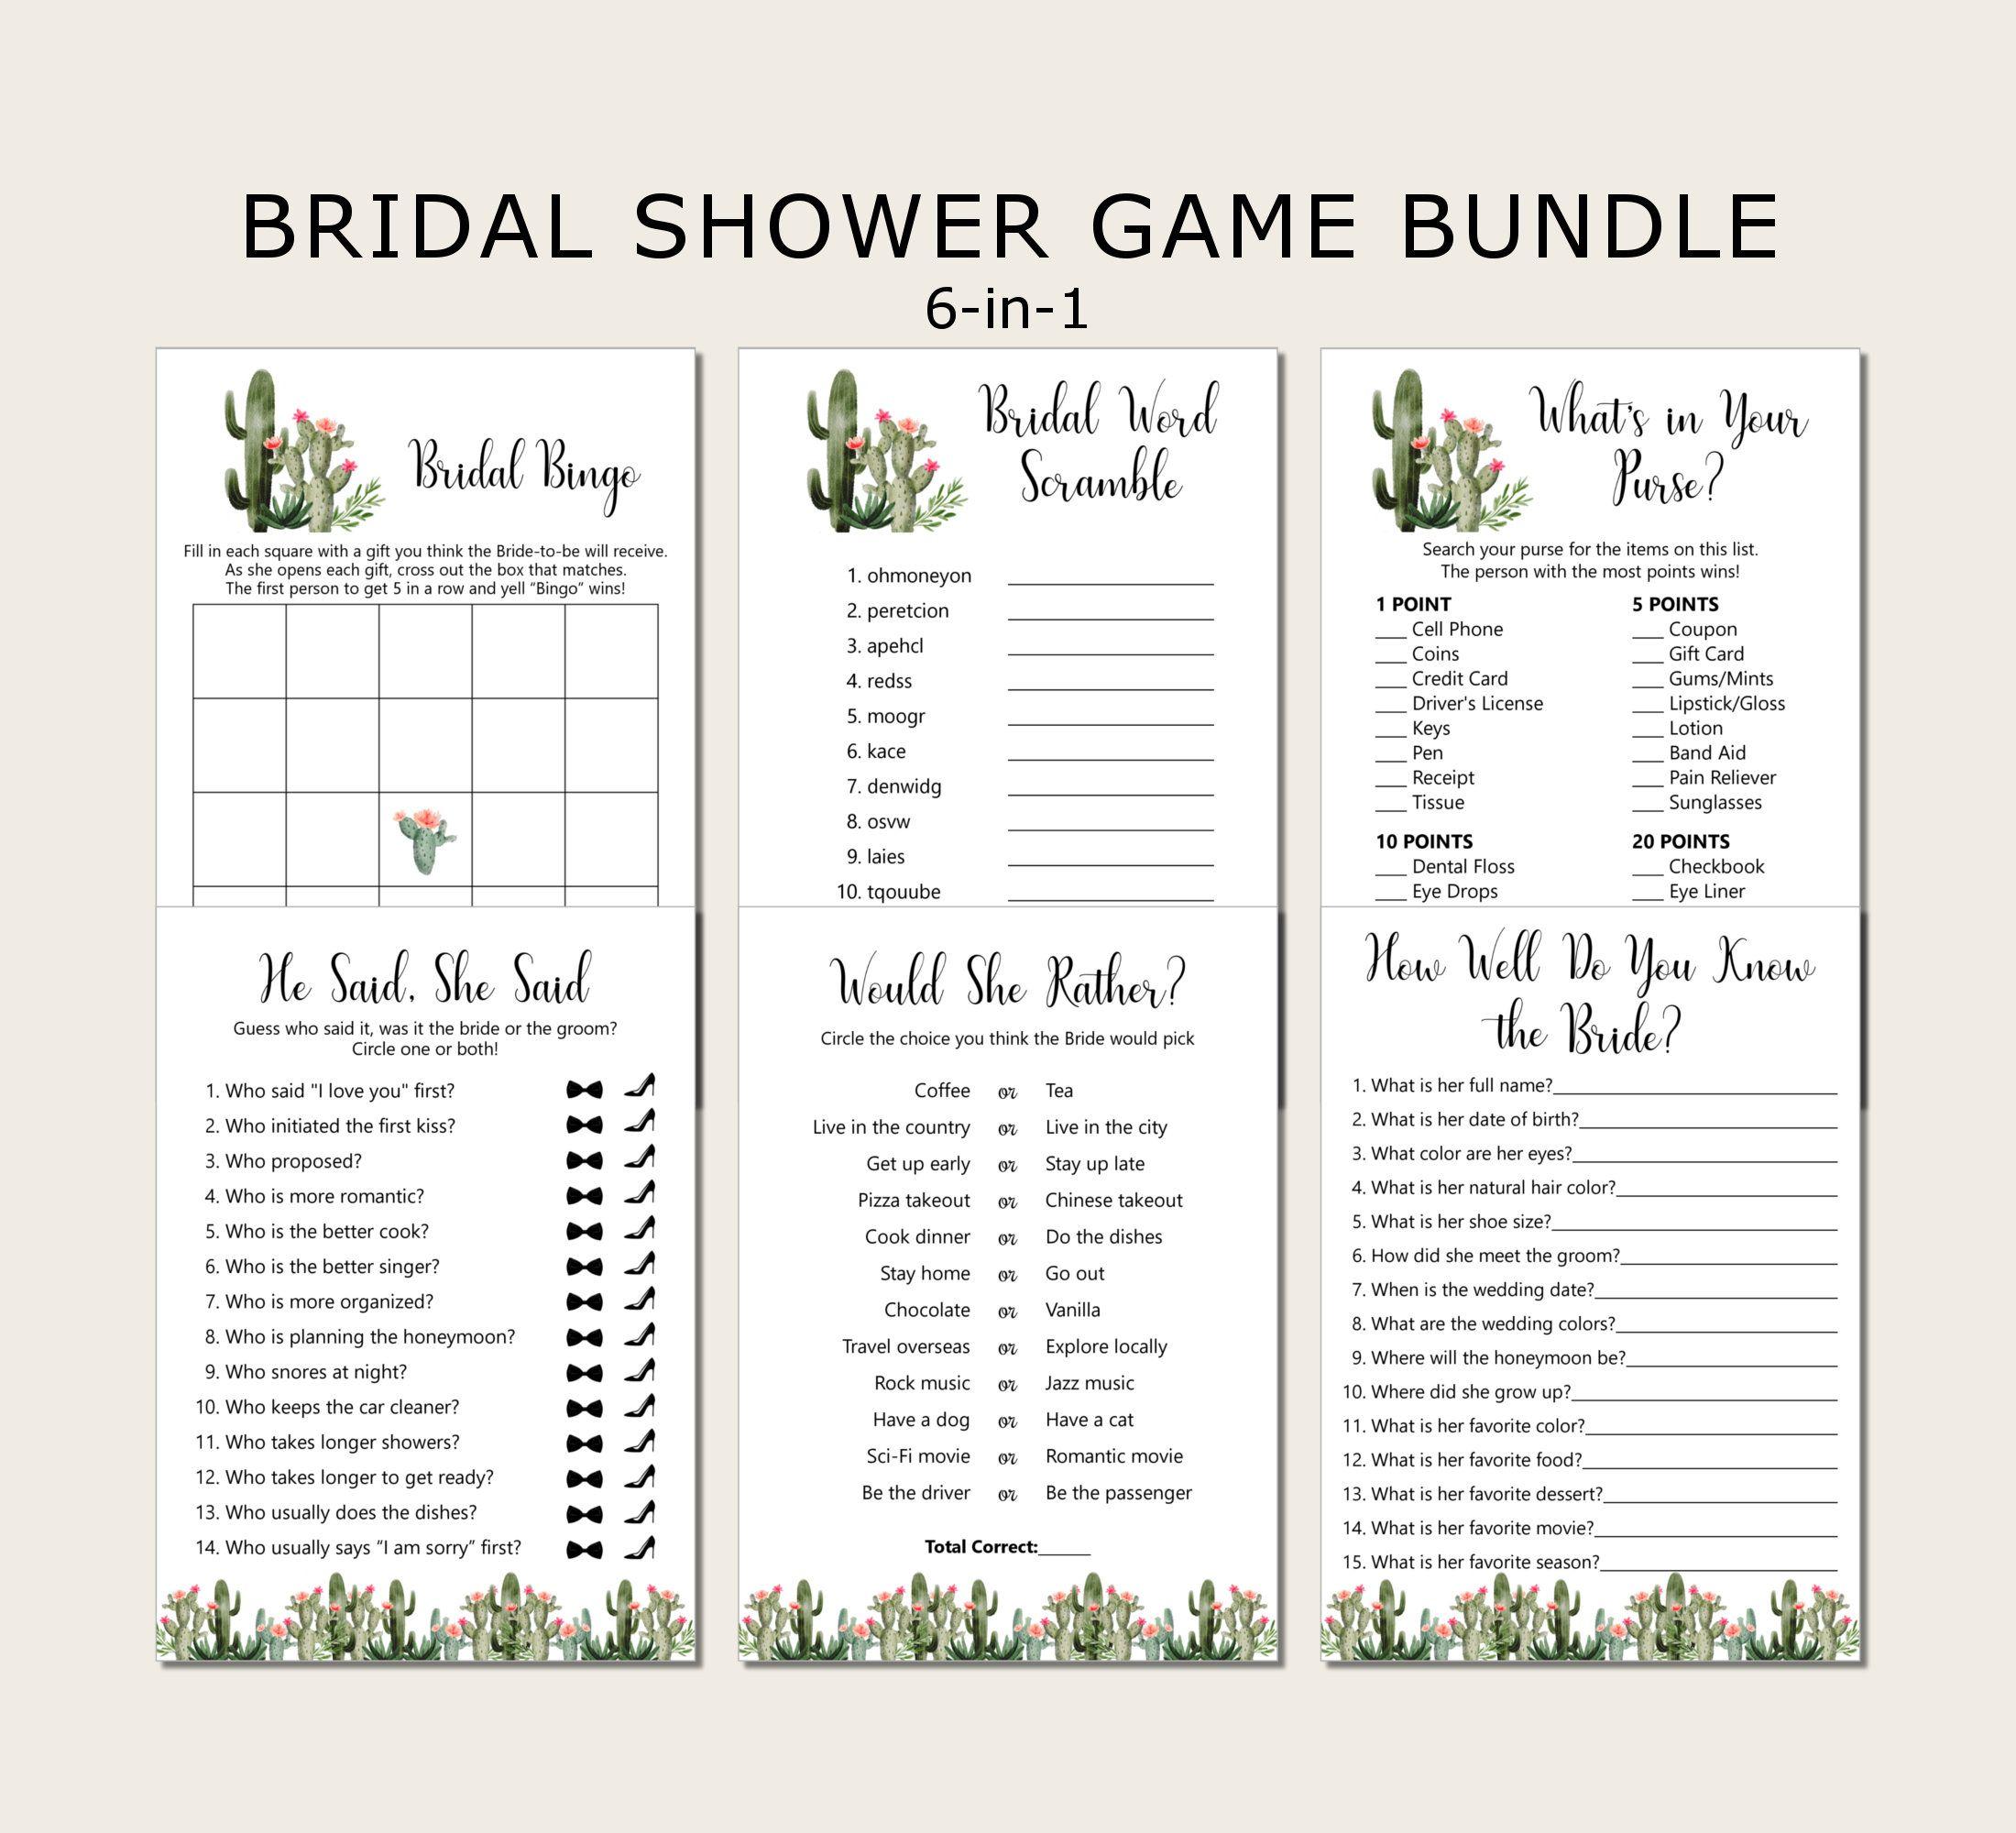 Succulent Cactus Bridal Shower Game Bundle Games Package Etsy In 2021 Bridal Shower Games Cactus Bridal Wedding Shower Games